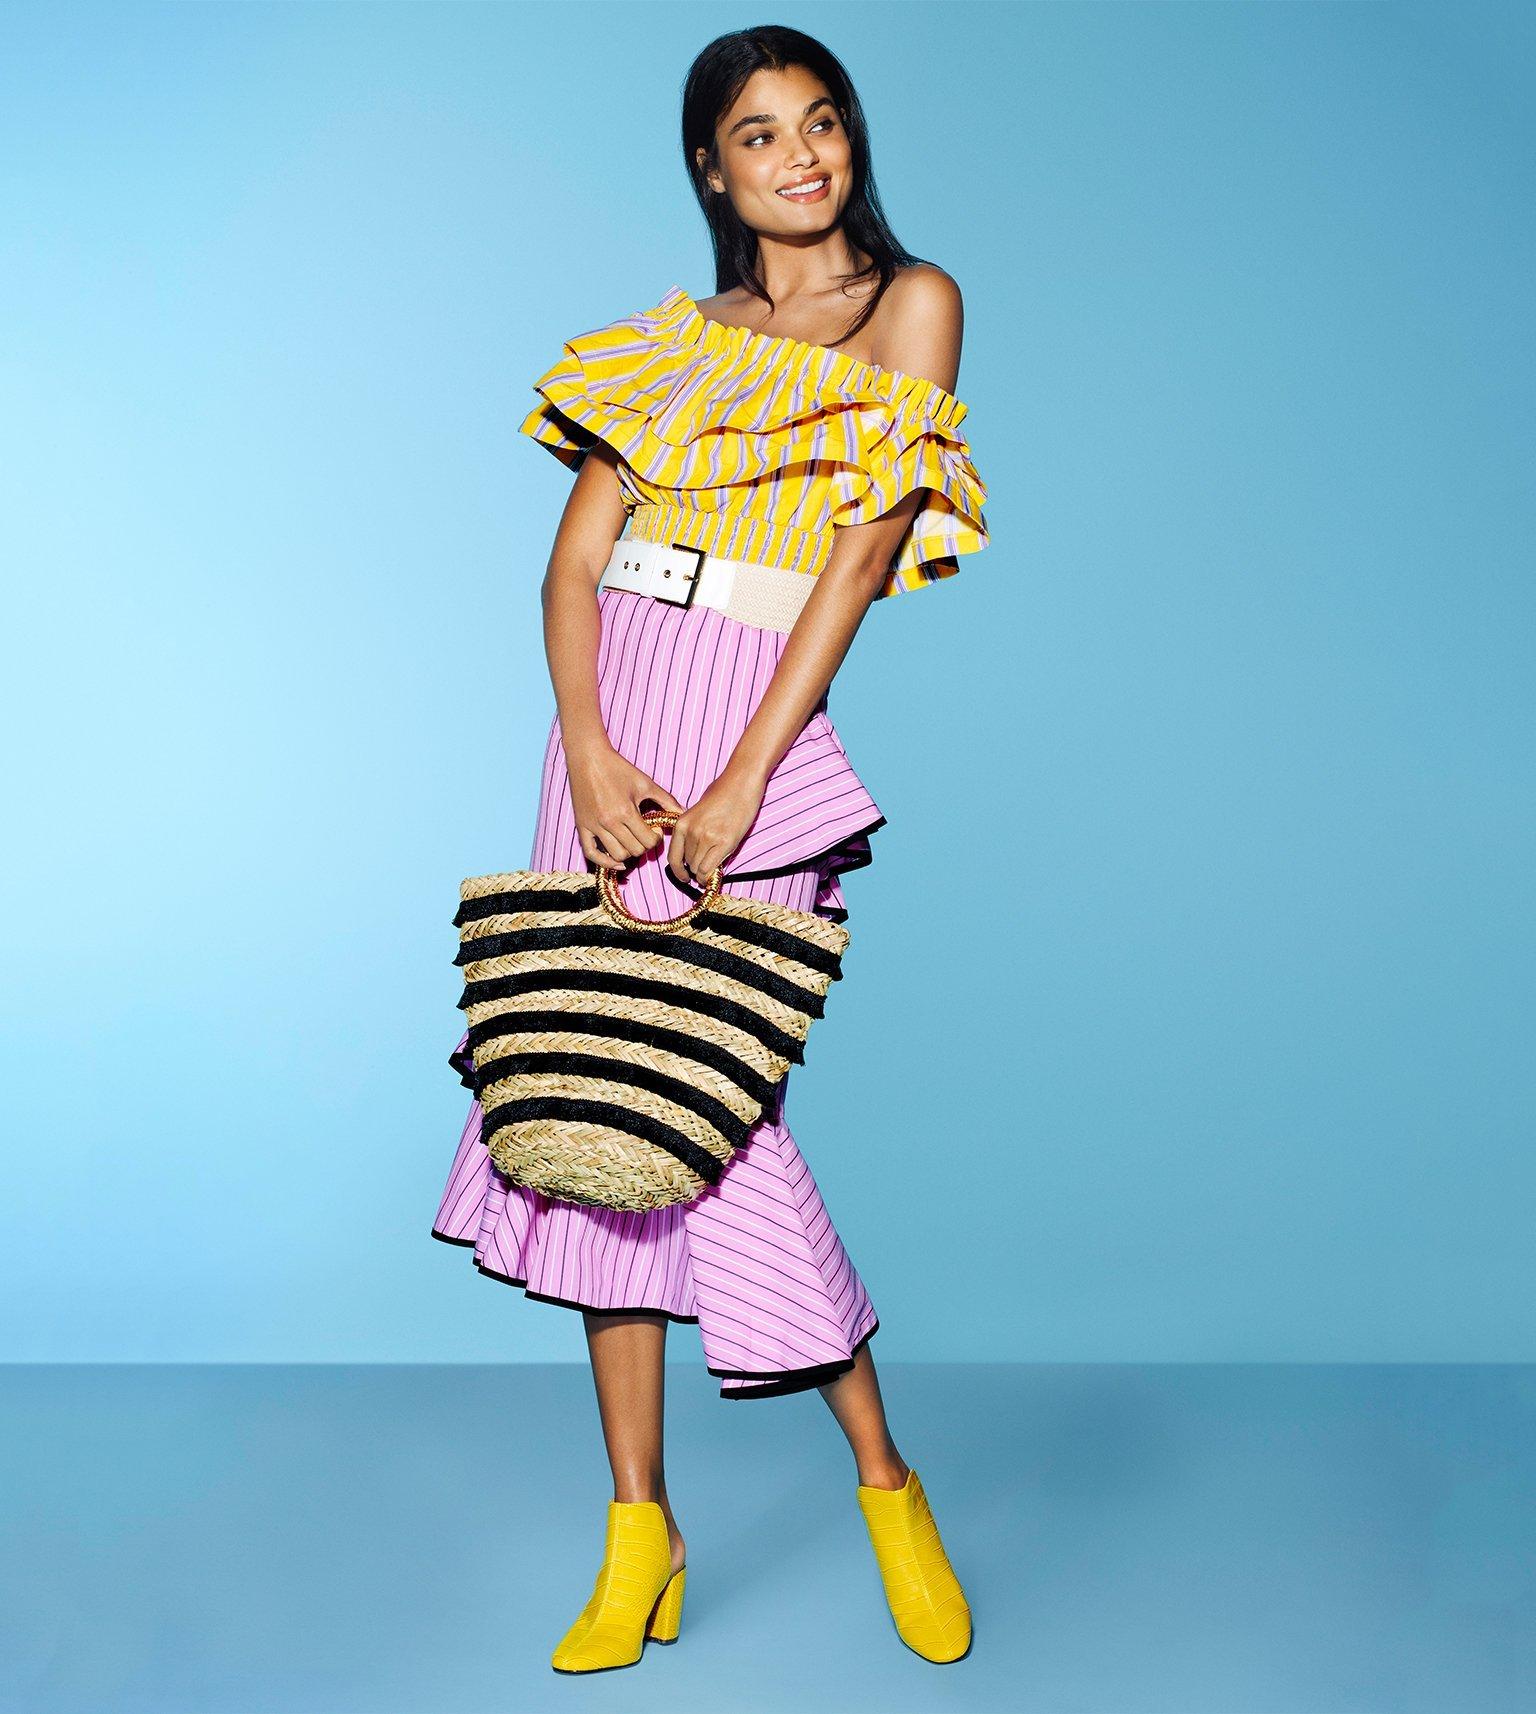 Women's Fashion Clothing Online